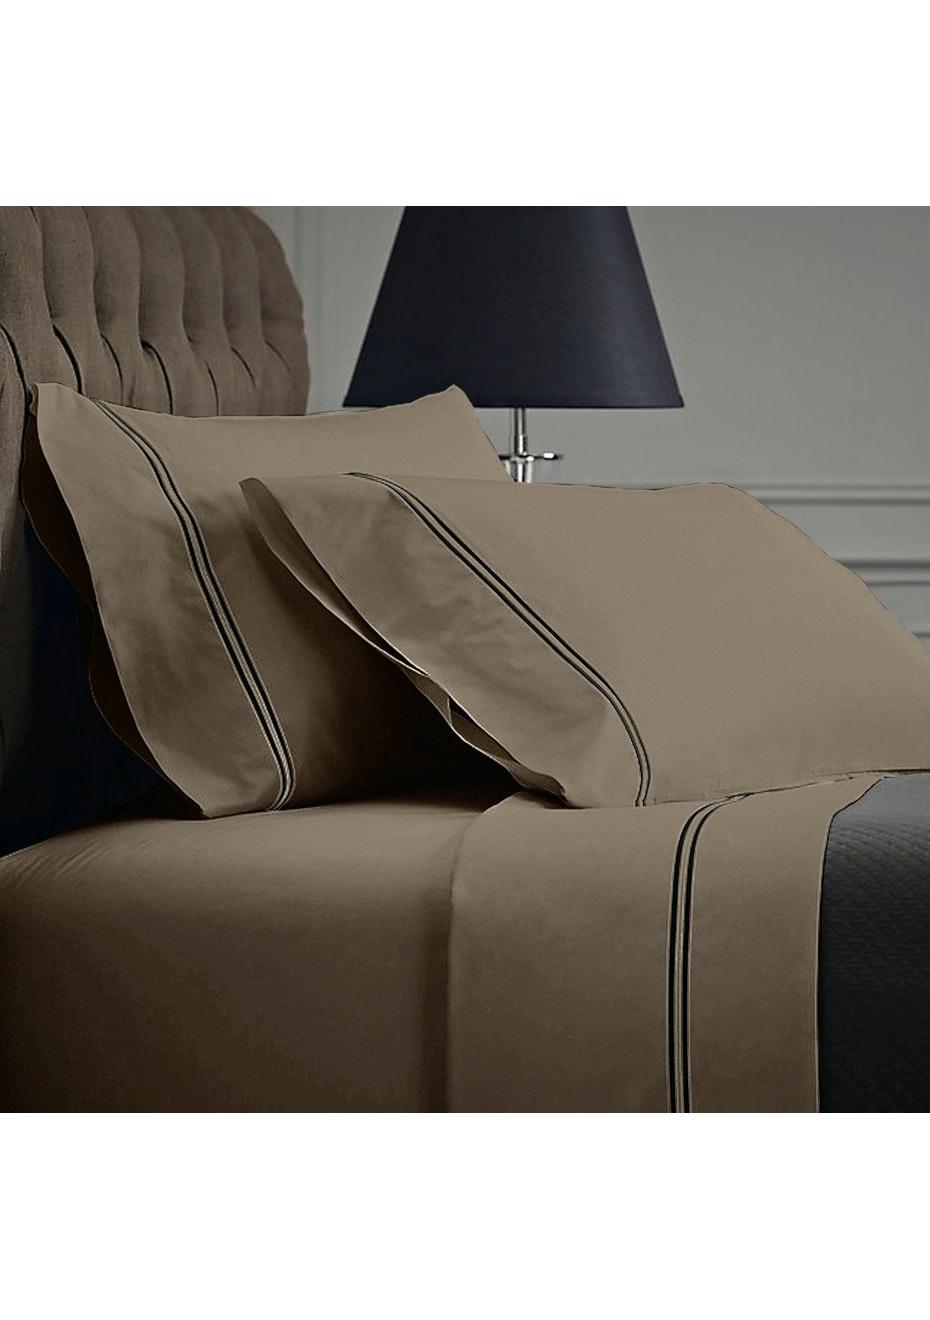 Style & Co 1000 Thread count Egyptian Cotton Hotel Collection Sorrento Sheet sets Queen Linen